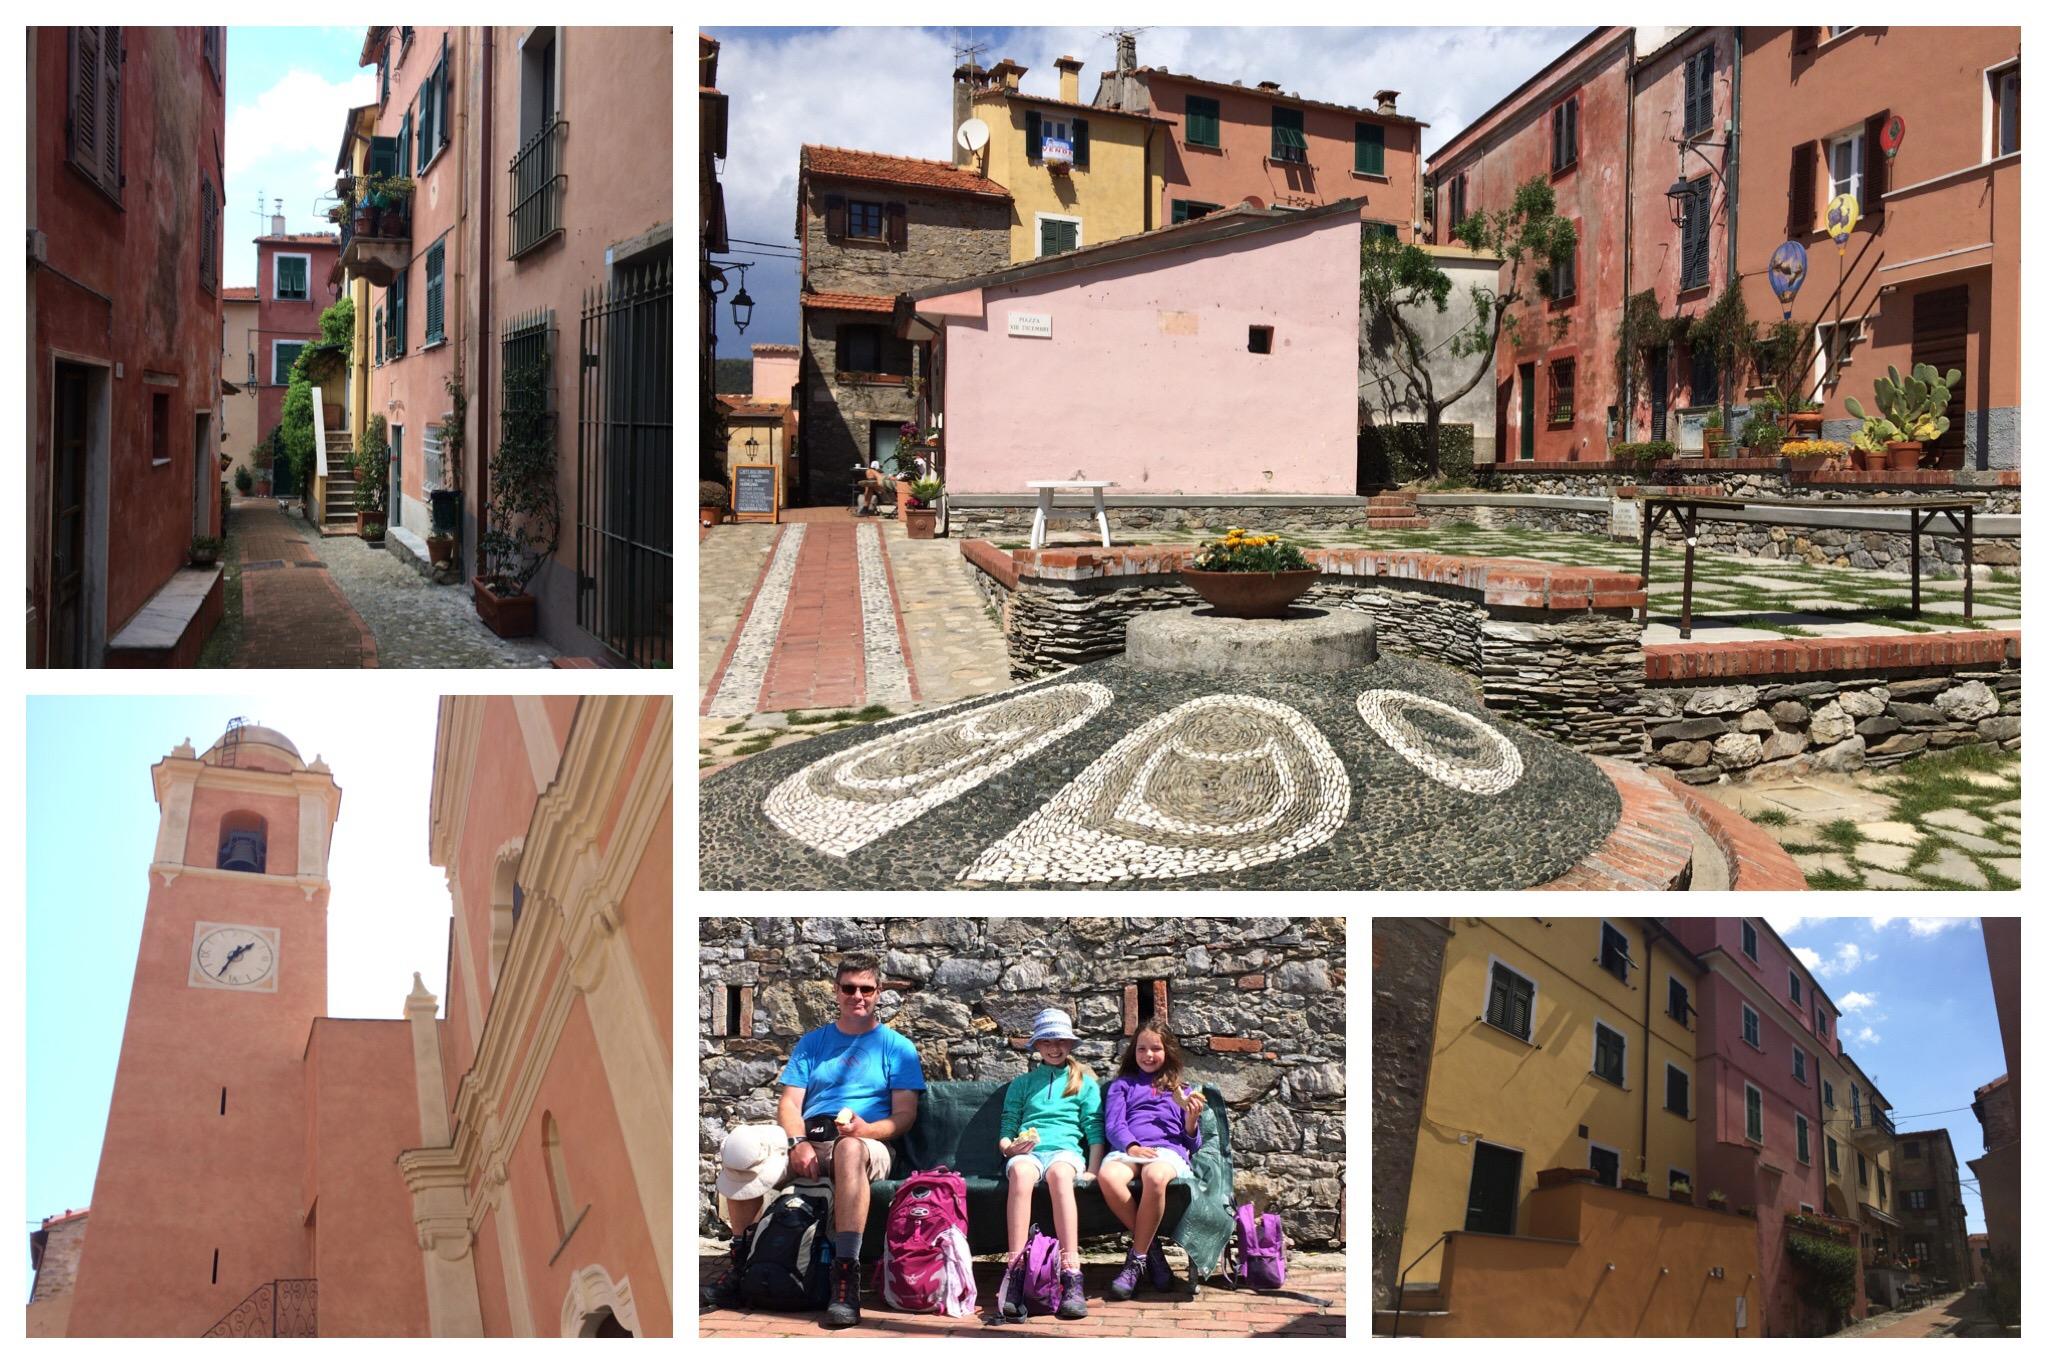 Liguria - Montemarcello